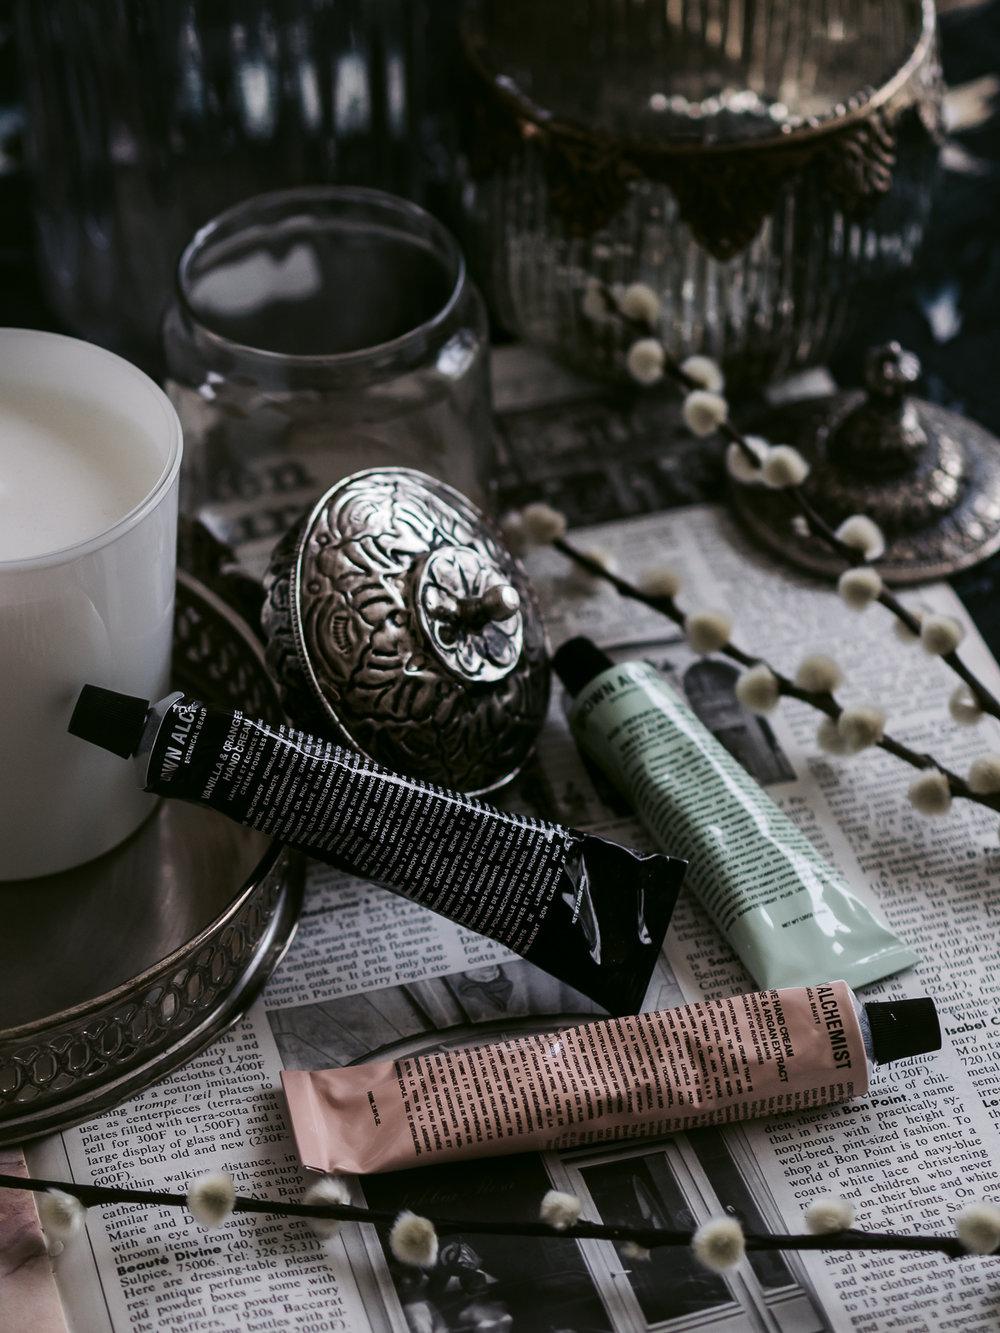 Grown Alchemist Hand Cream - 10-10 Hope - Yes! Please Enjoy.jpg